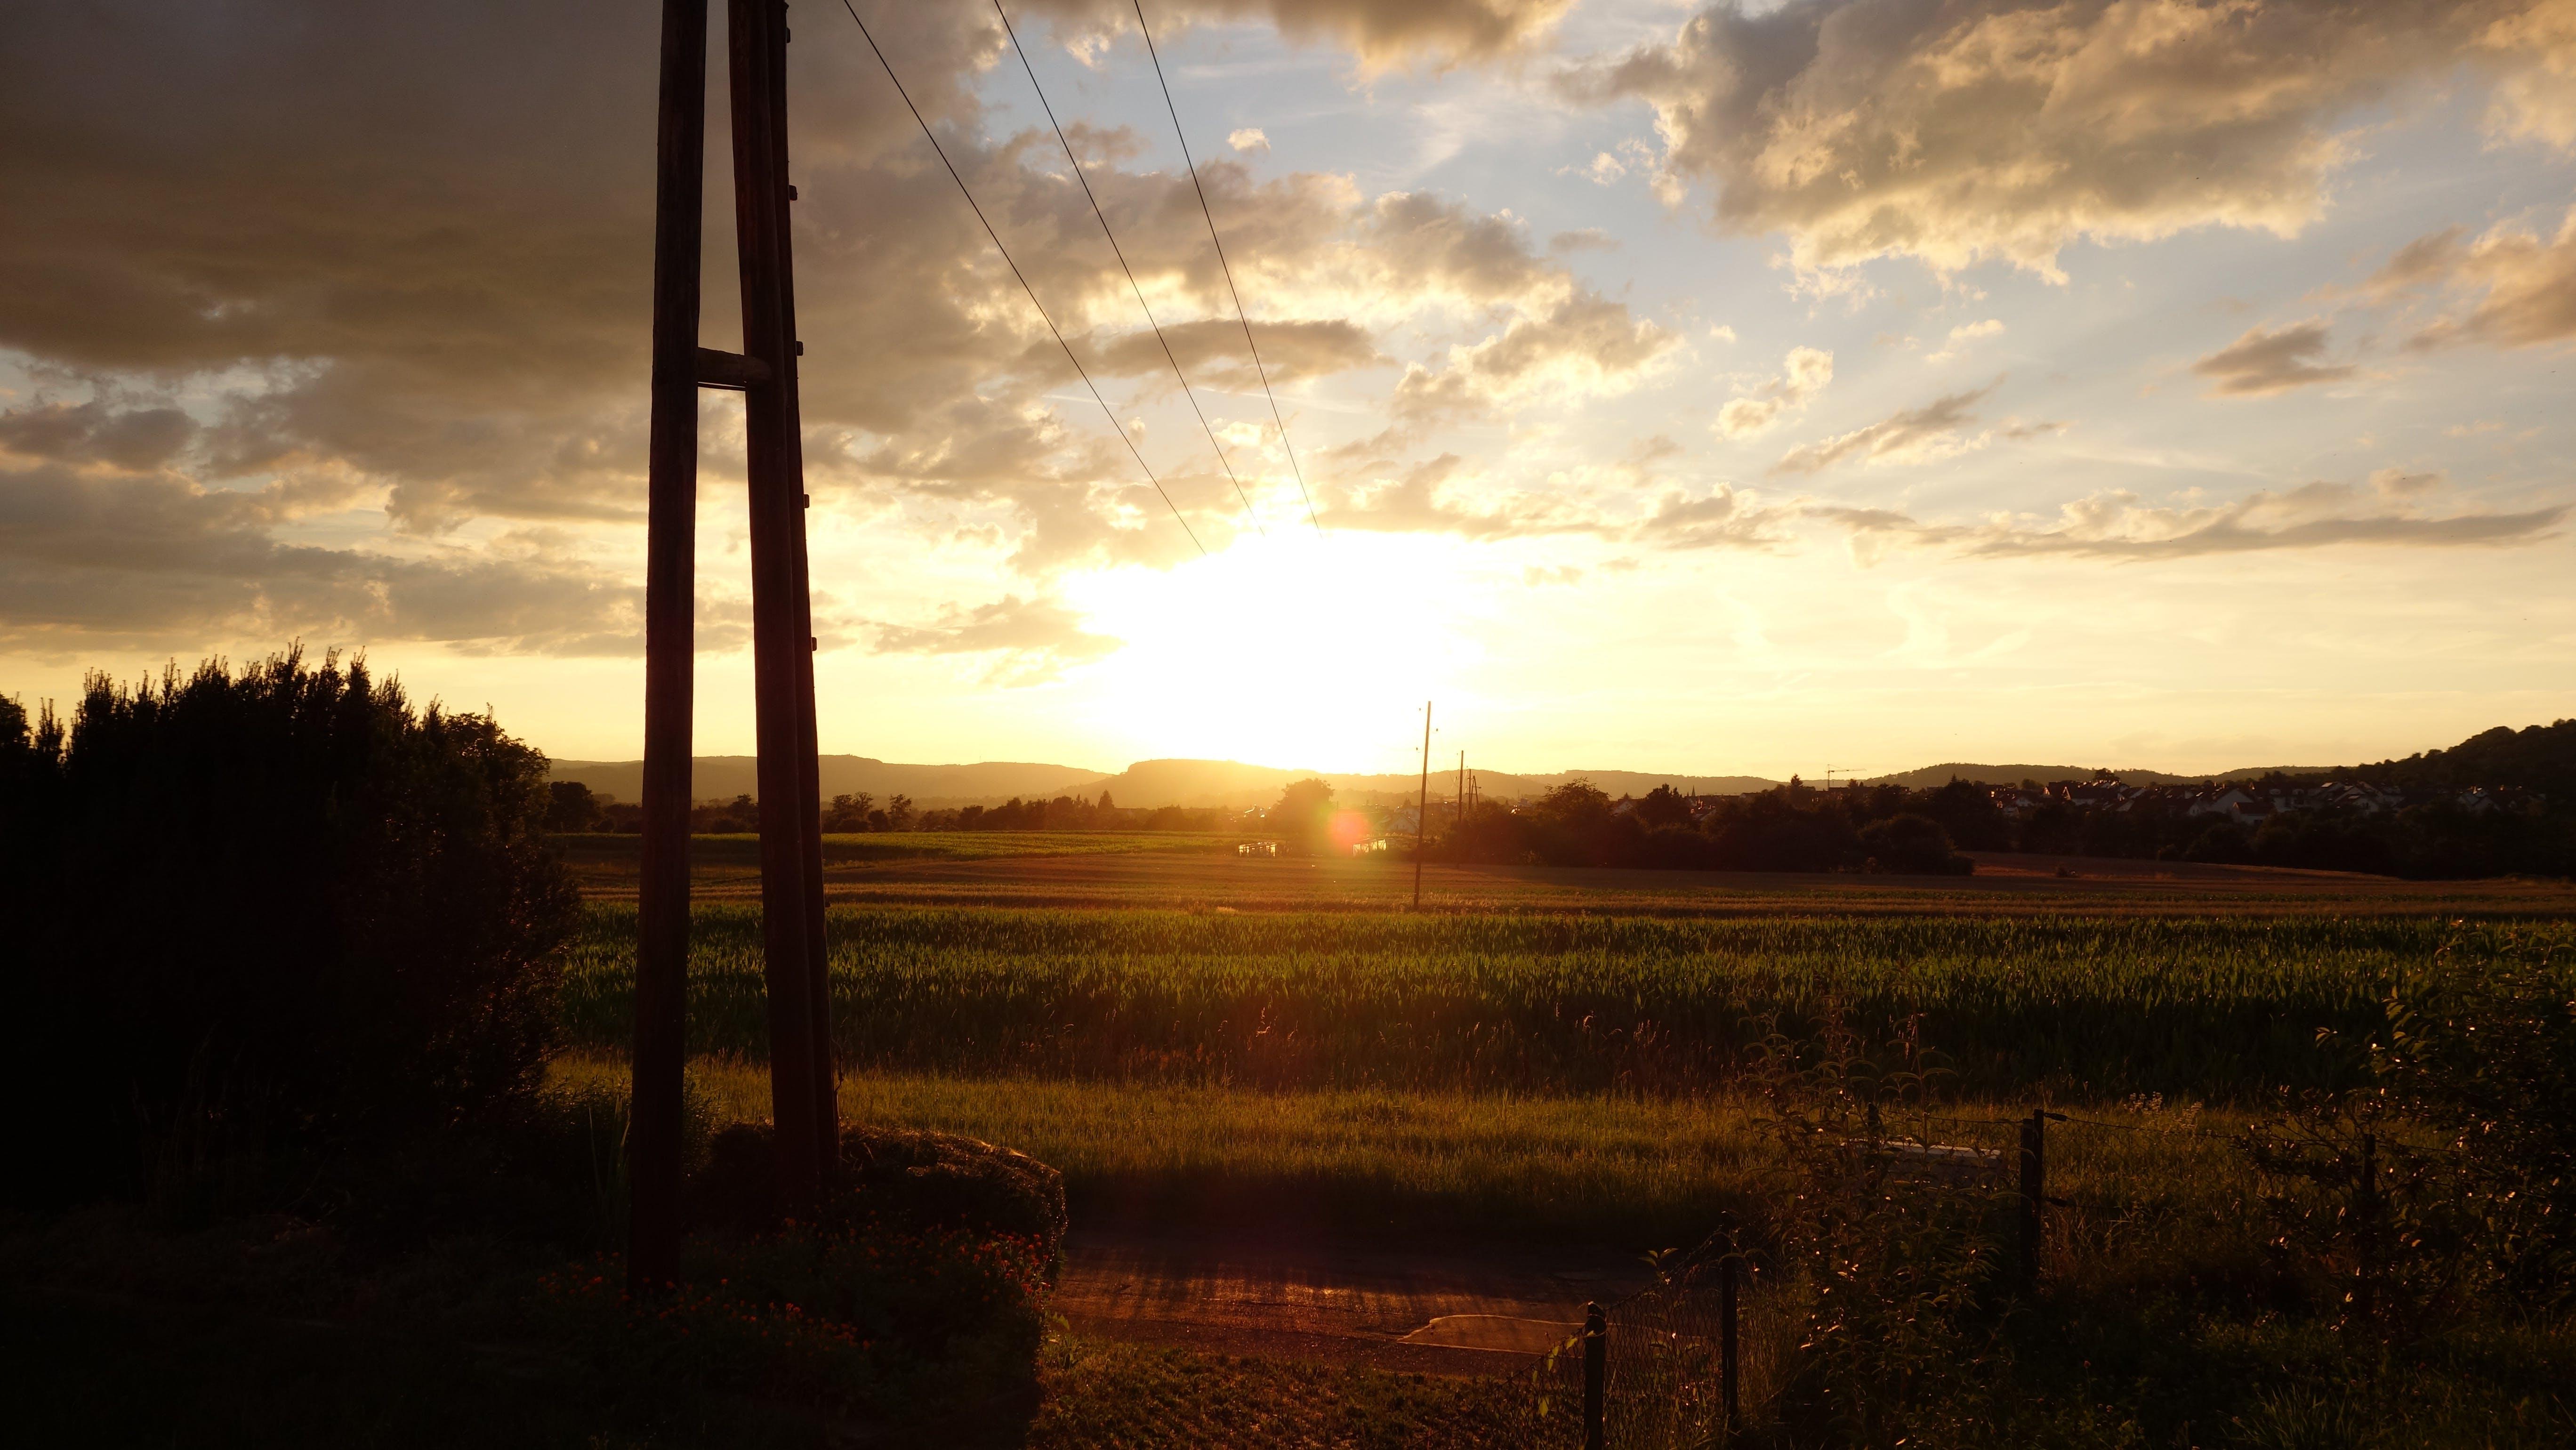 Gratis stockfoto met boerderij, dageraad, gras, hemel